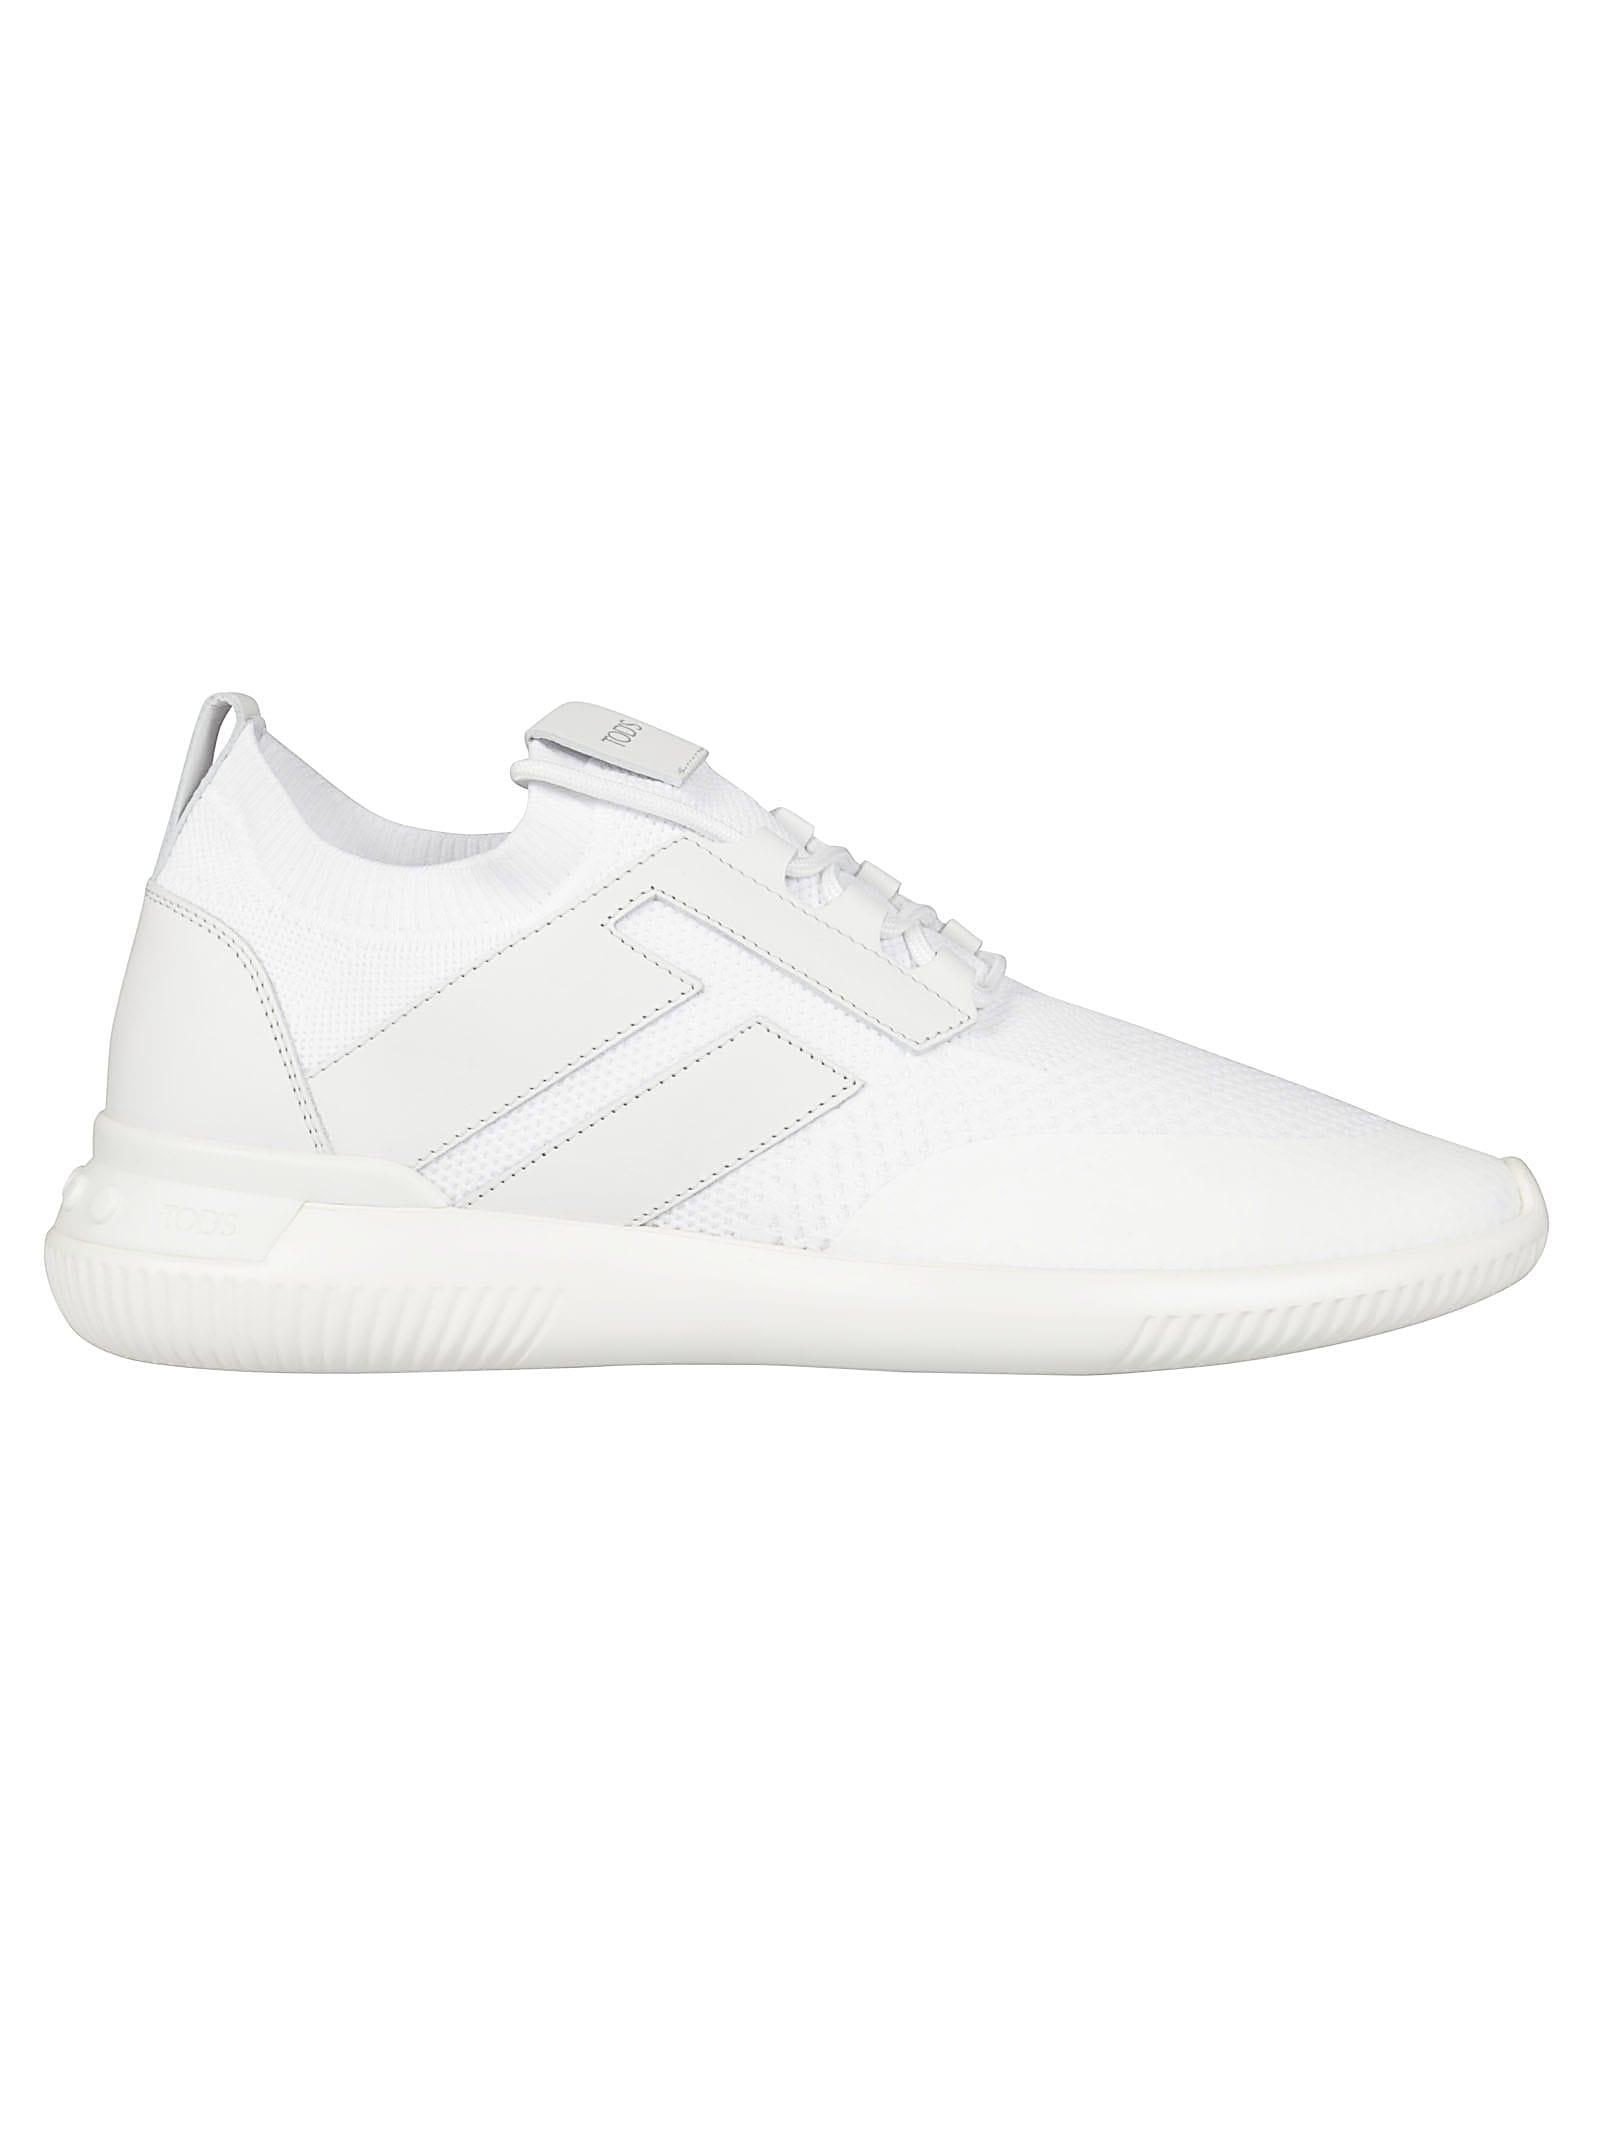 Tods Mesh Sneakers